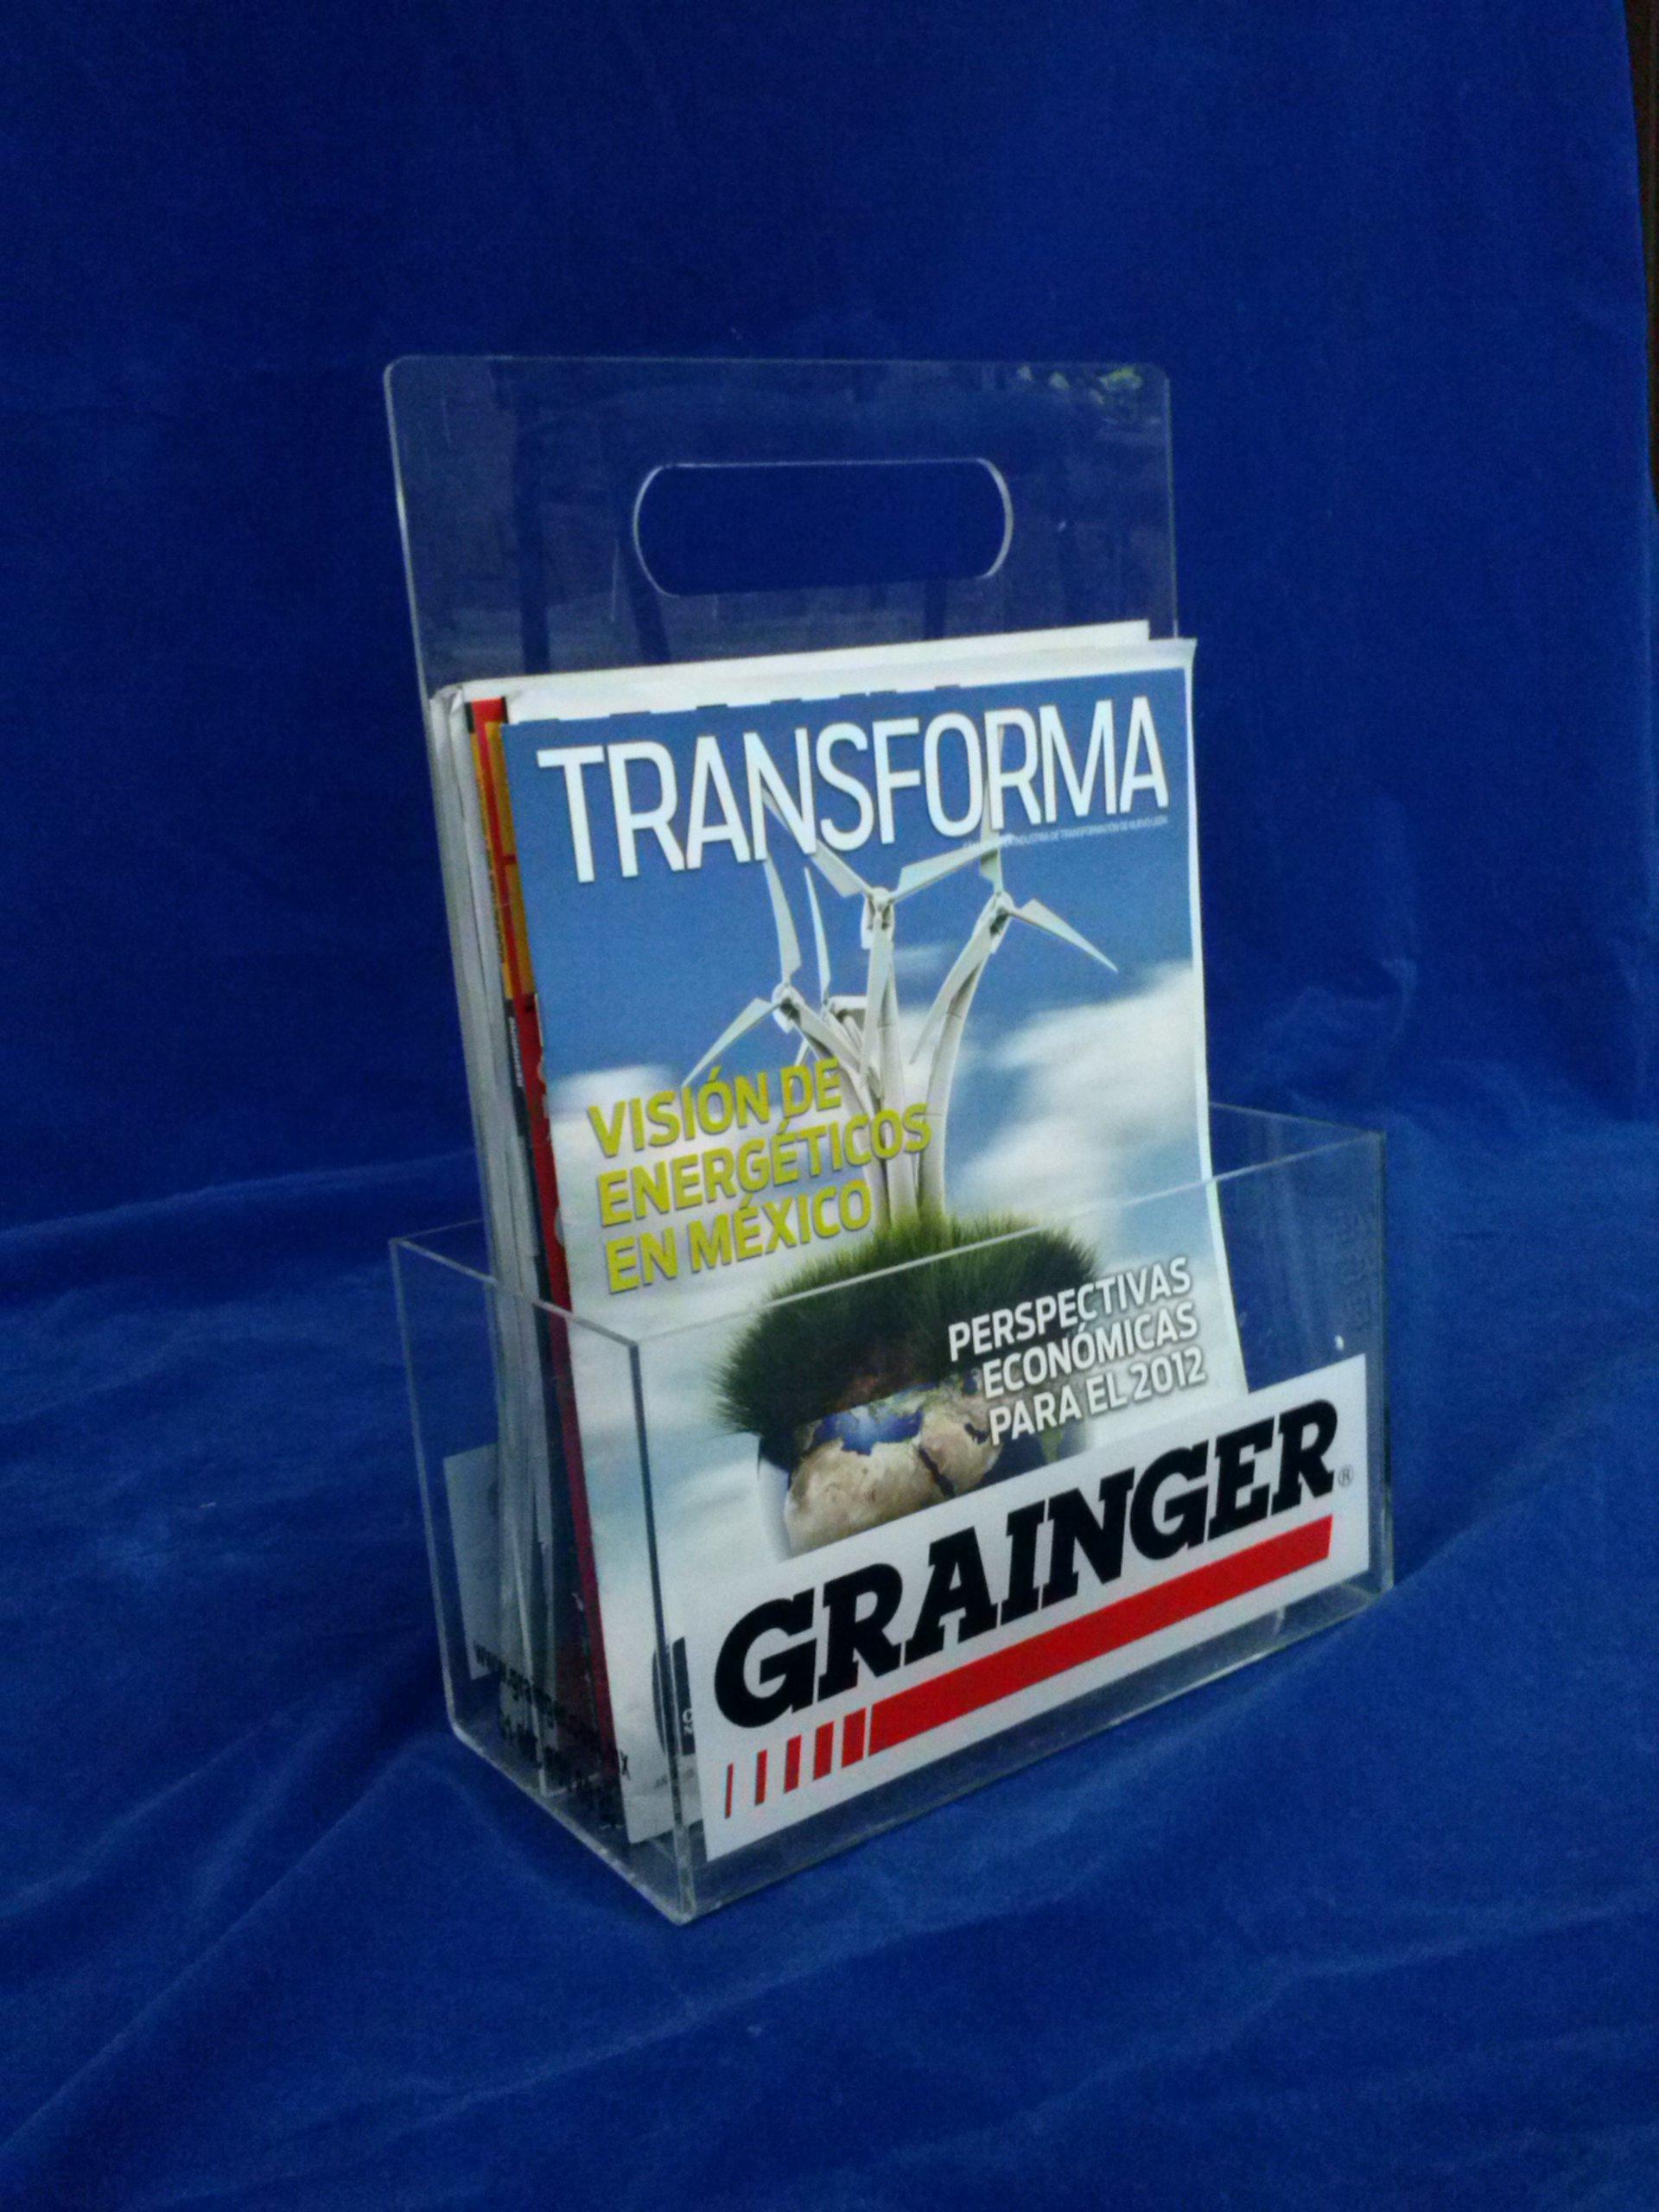 Porta Revistas Grainger2